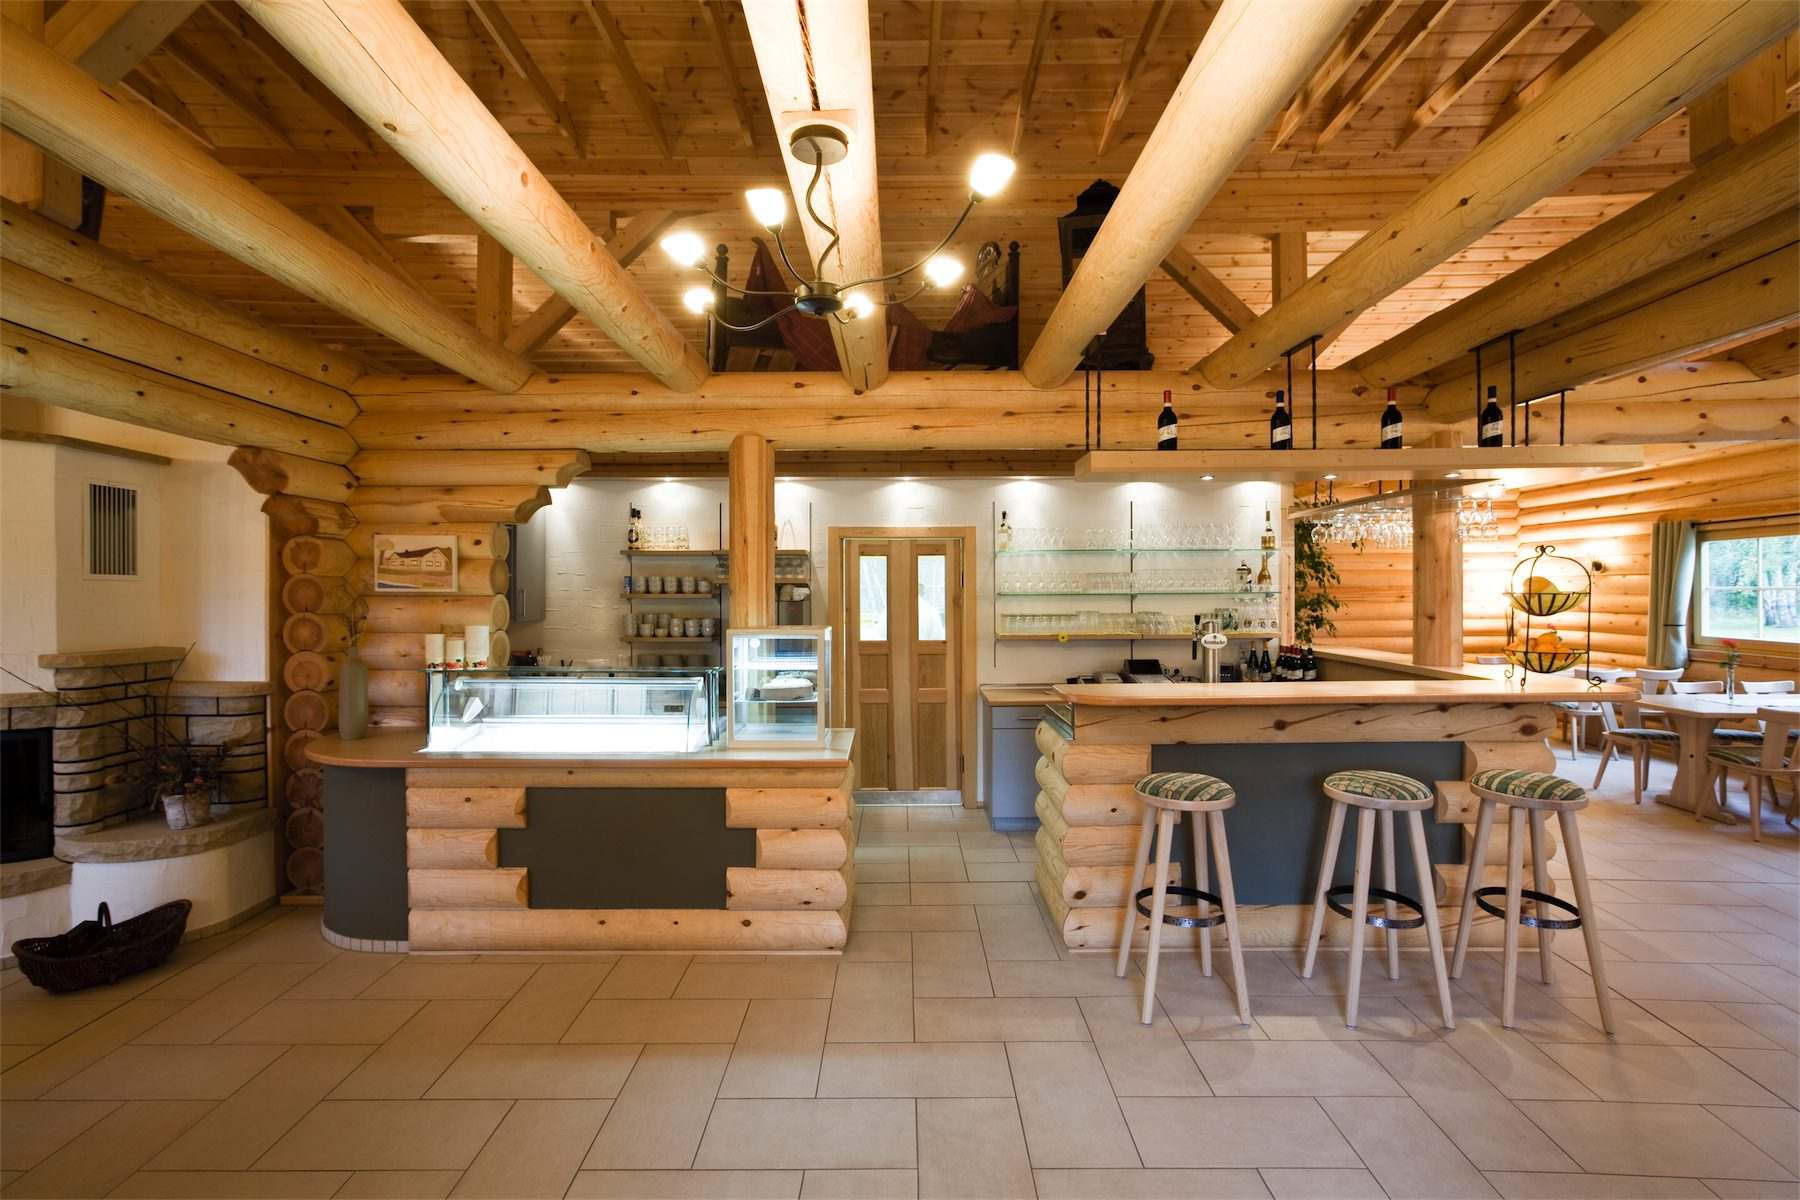 Erfreut Blockhaus Wohnideen Bilder - Images for inspirierende Ideen ...